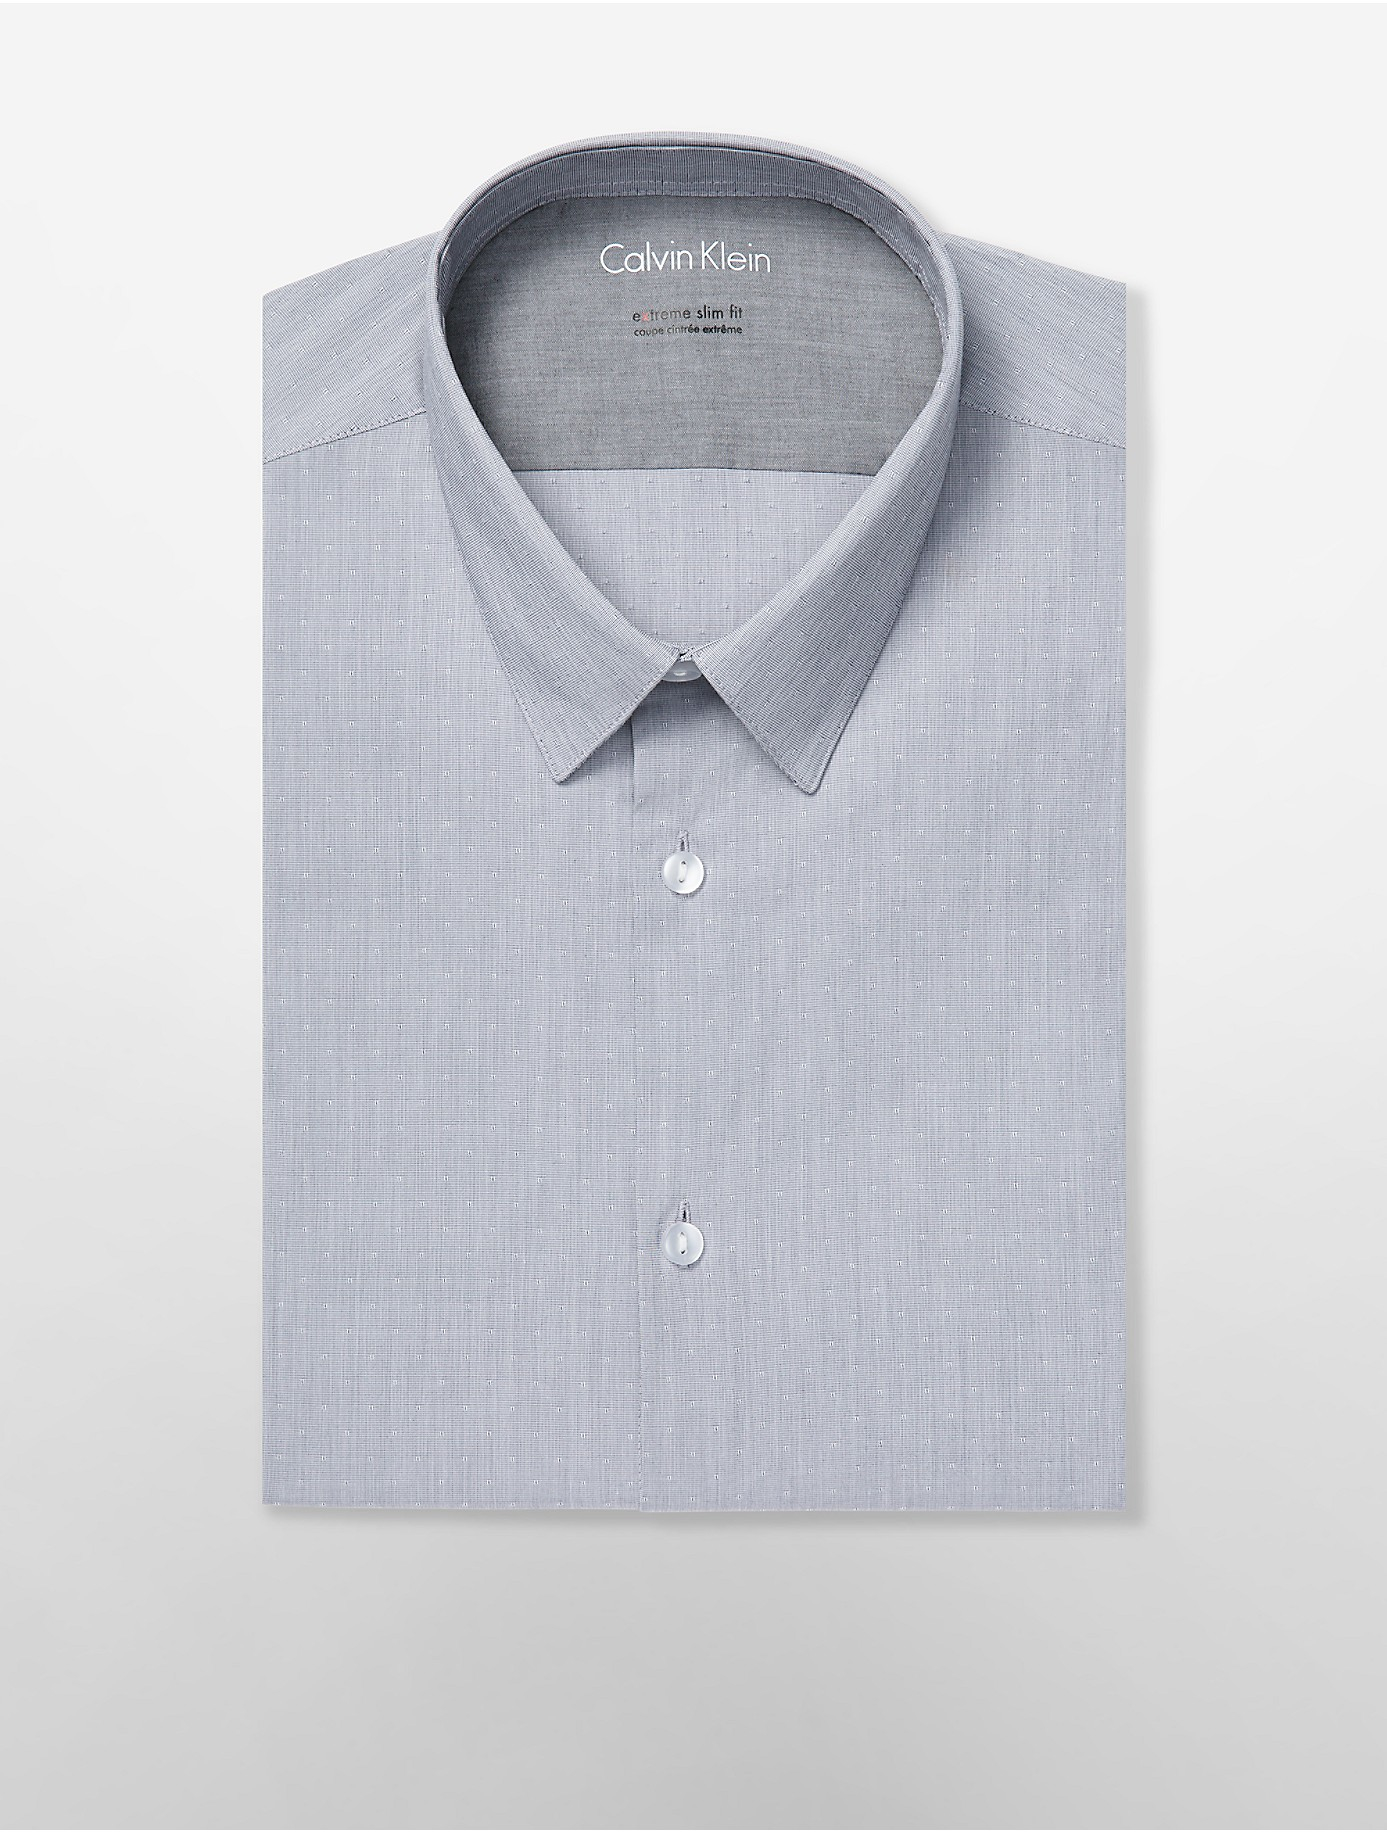 Calvin klein x fit ultra slim fit shadow dot dress shirt for Calvin klein x fit dress shirt